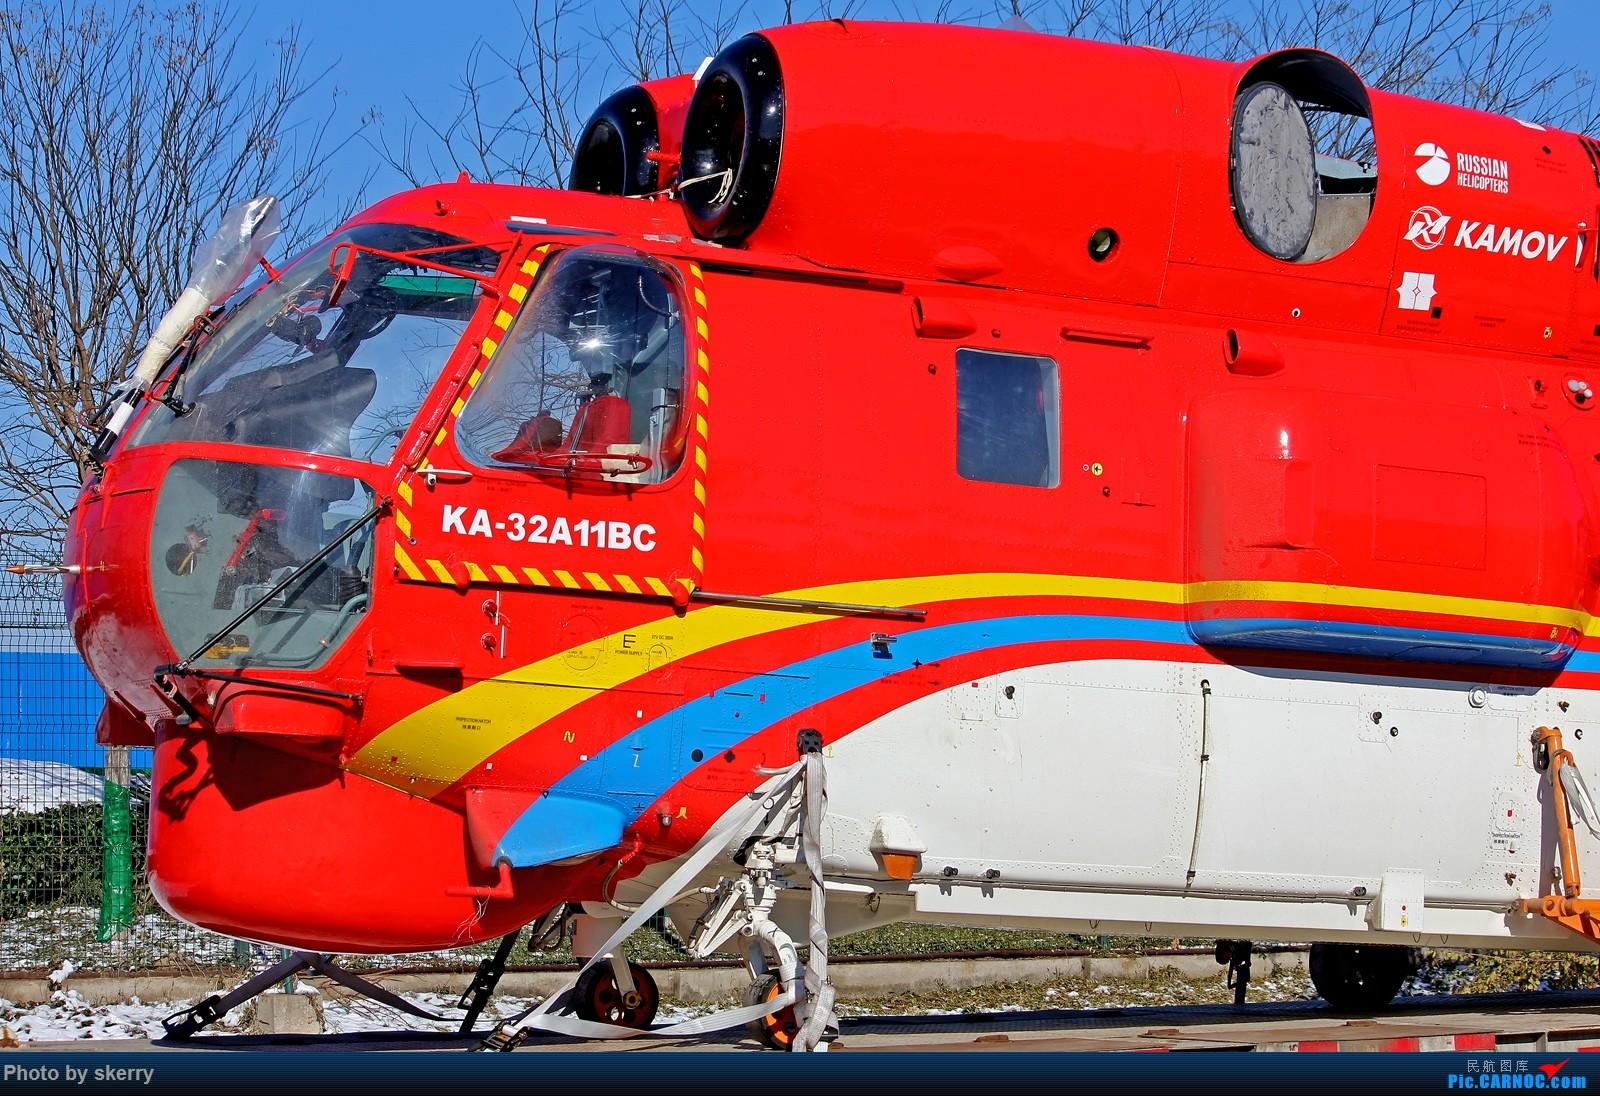 ***【TSN飞友会】双11海淘的终于到货了-KA-32A11BC**** KA-32  天津滨海国际机场